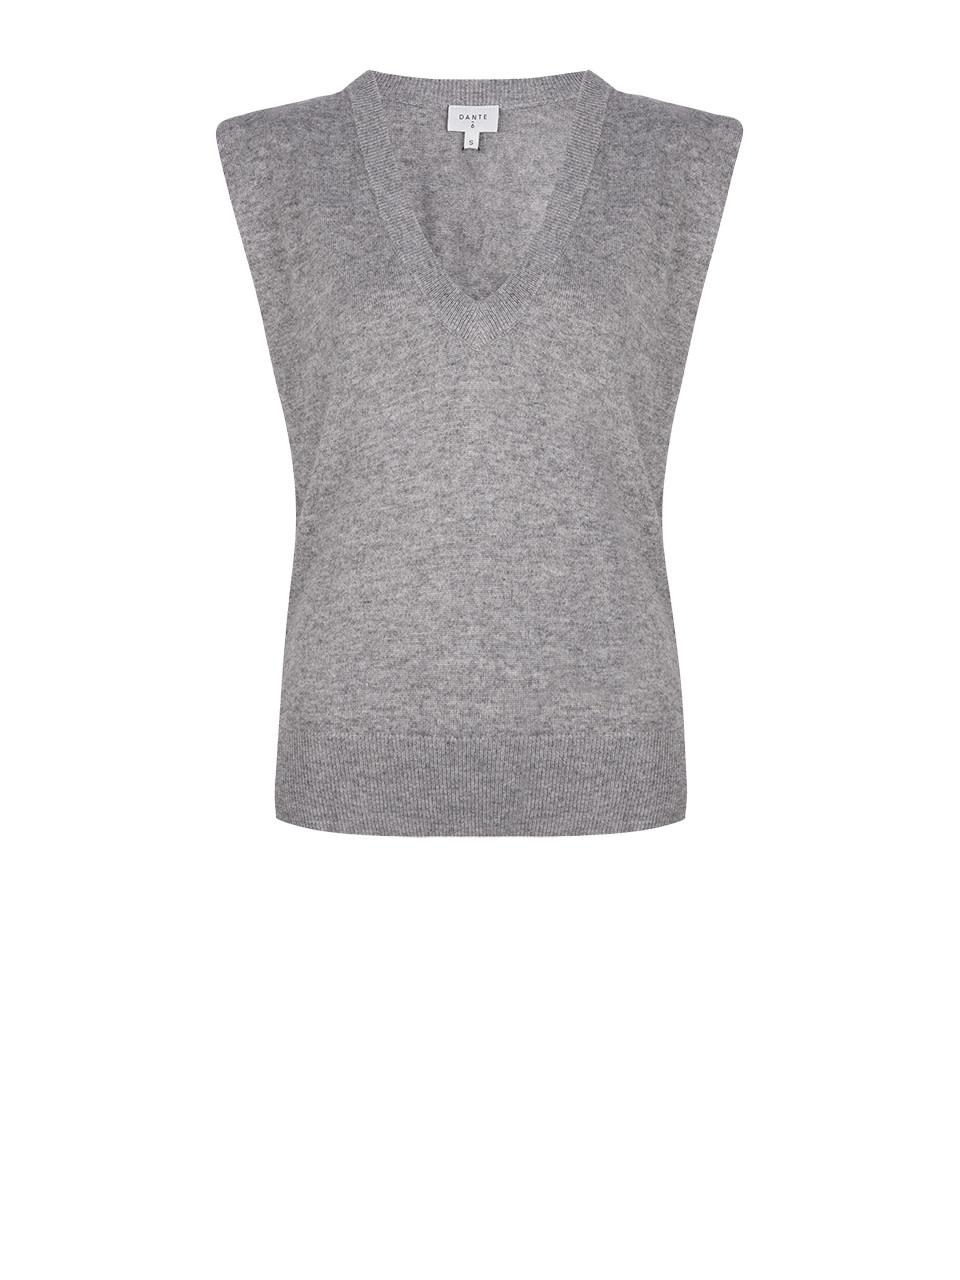 talou spencer heather grey-1